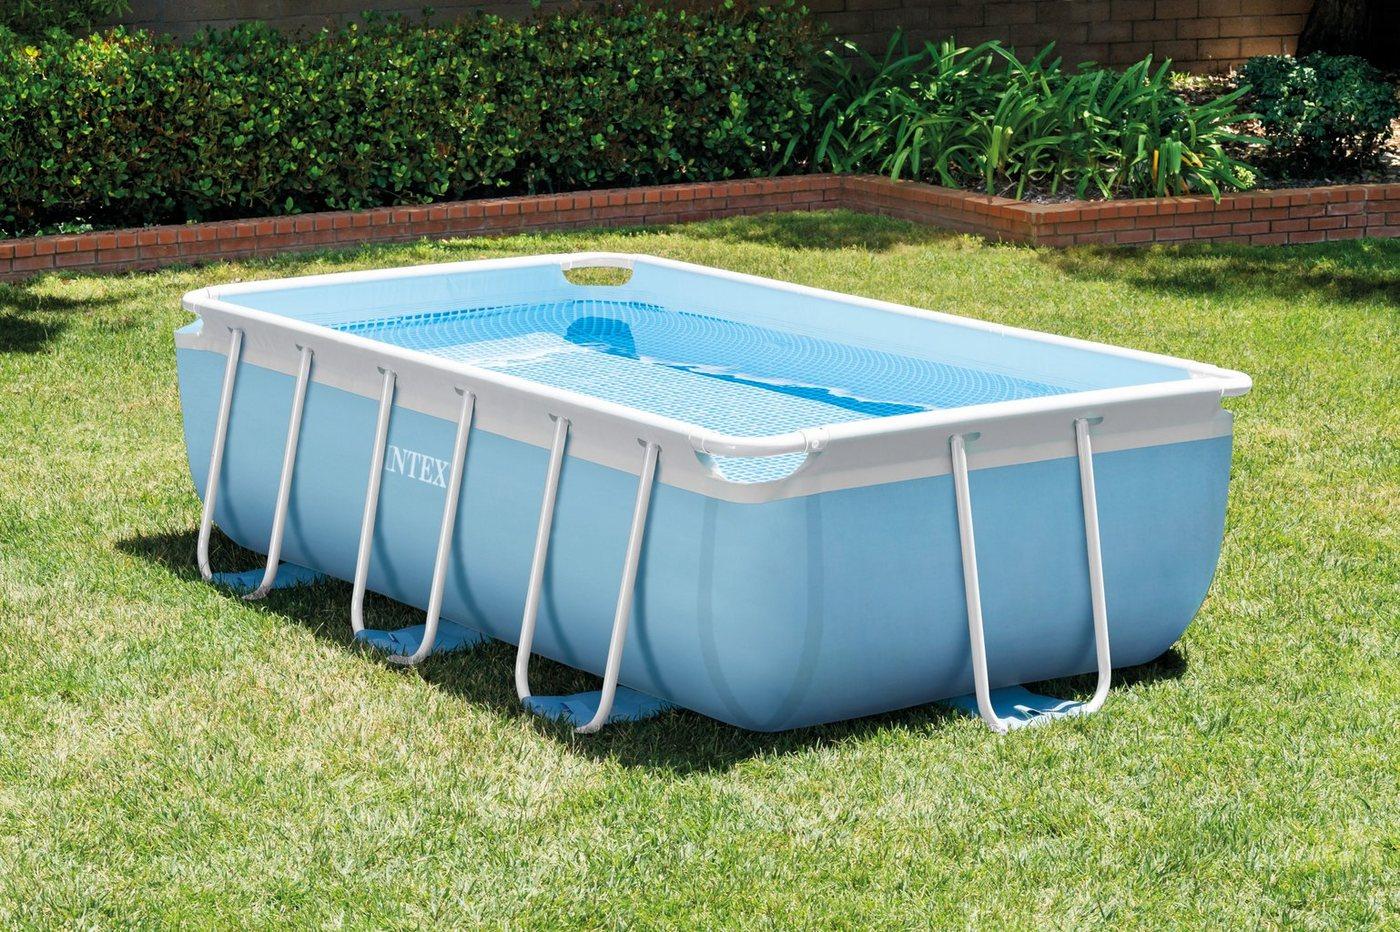 exit frame pool 4x2x1m grau grau grau m bel preiswert online kaufen vergleichen. Black Bedroom Furniture Sets. Home Design Ideas